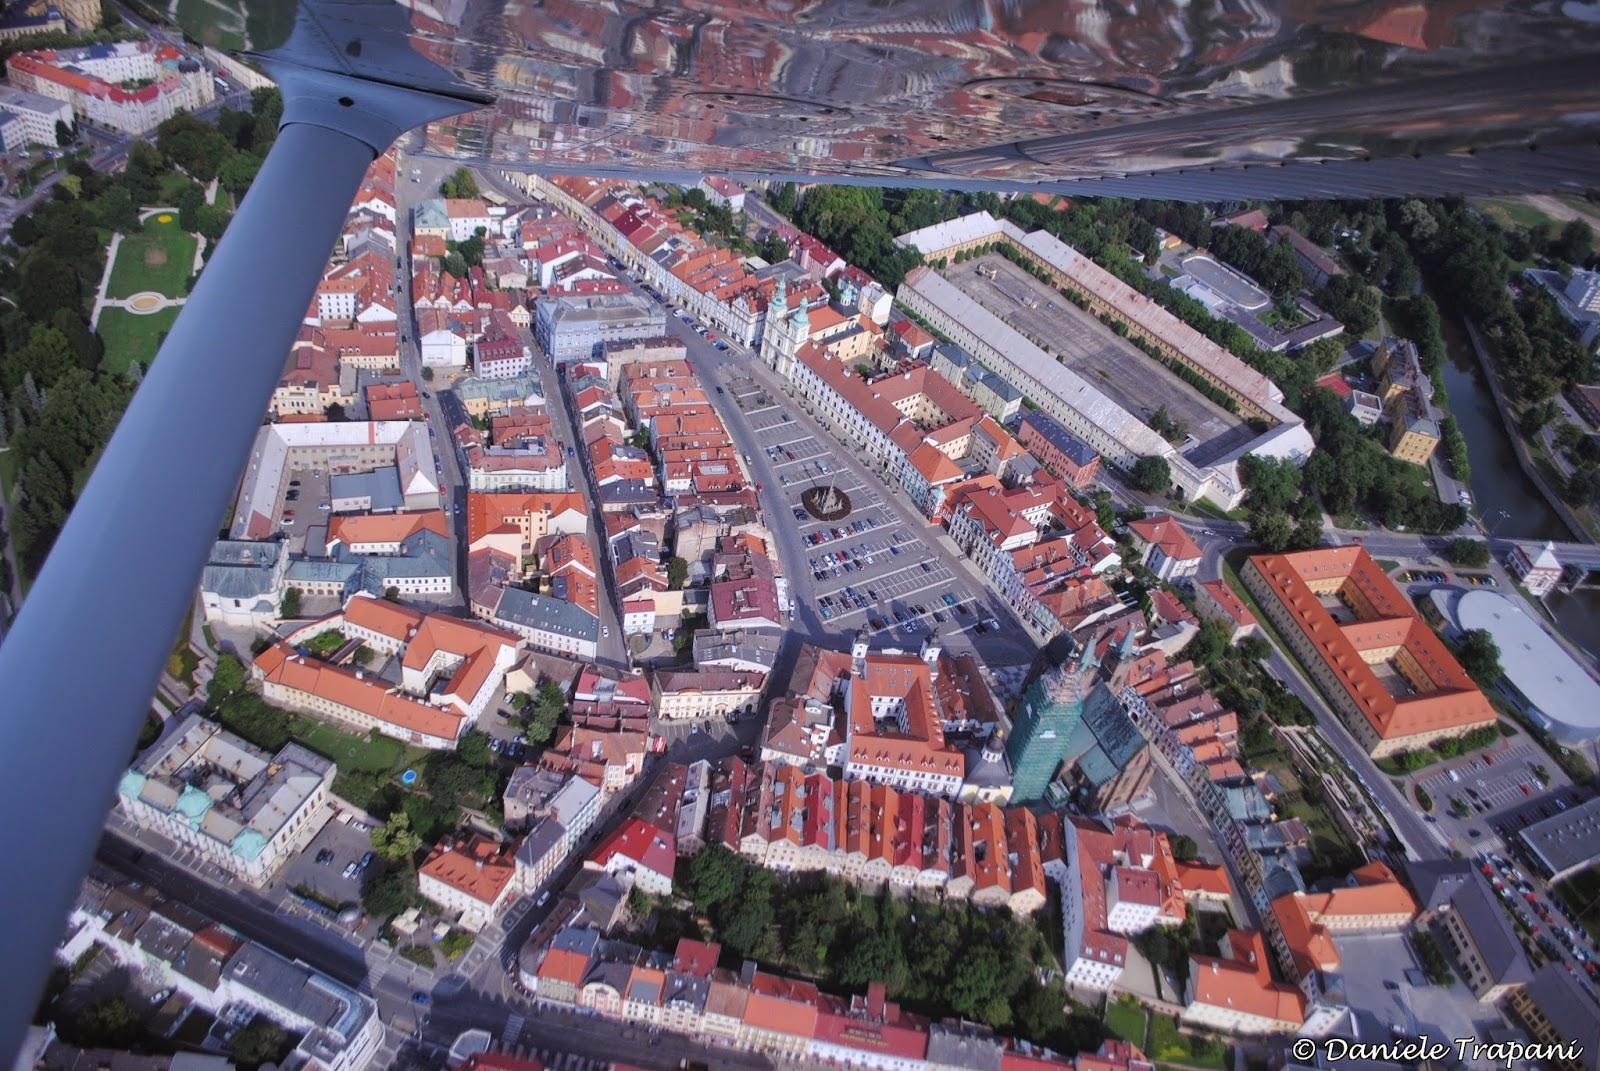 Vista aerea del centro storico di Hradec Králové